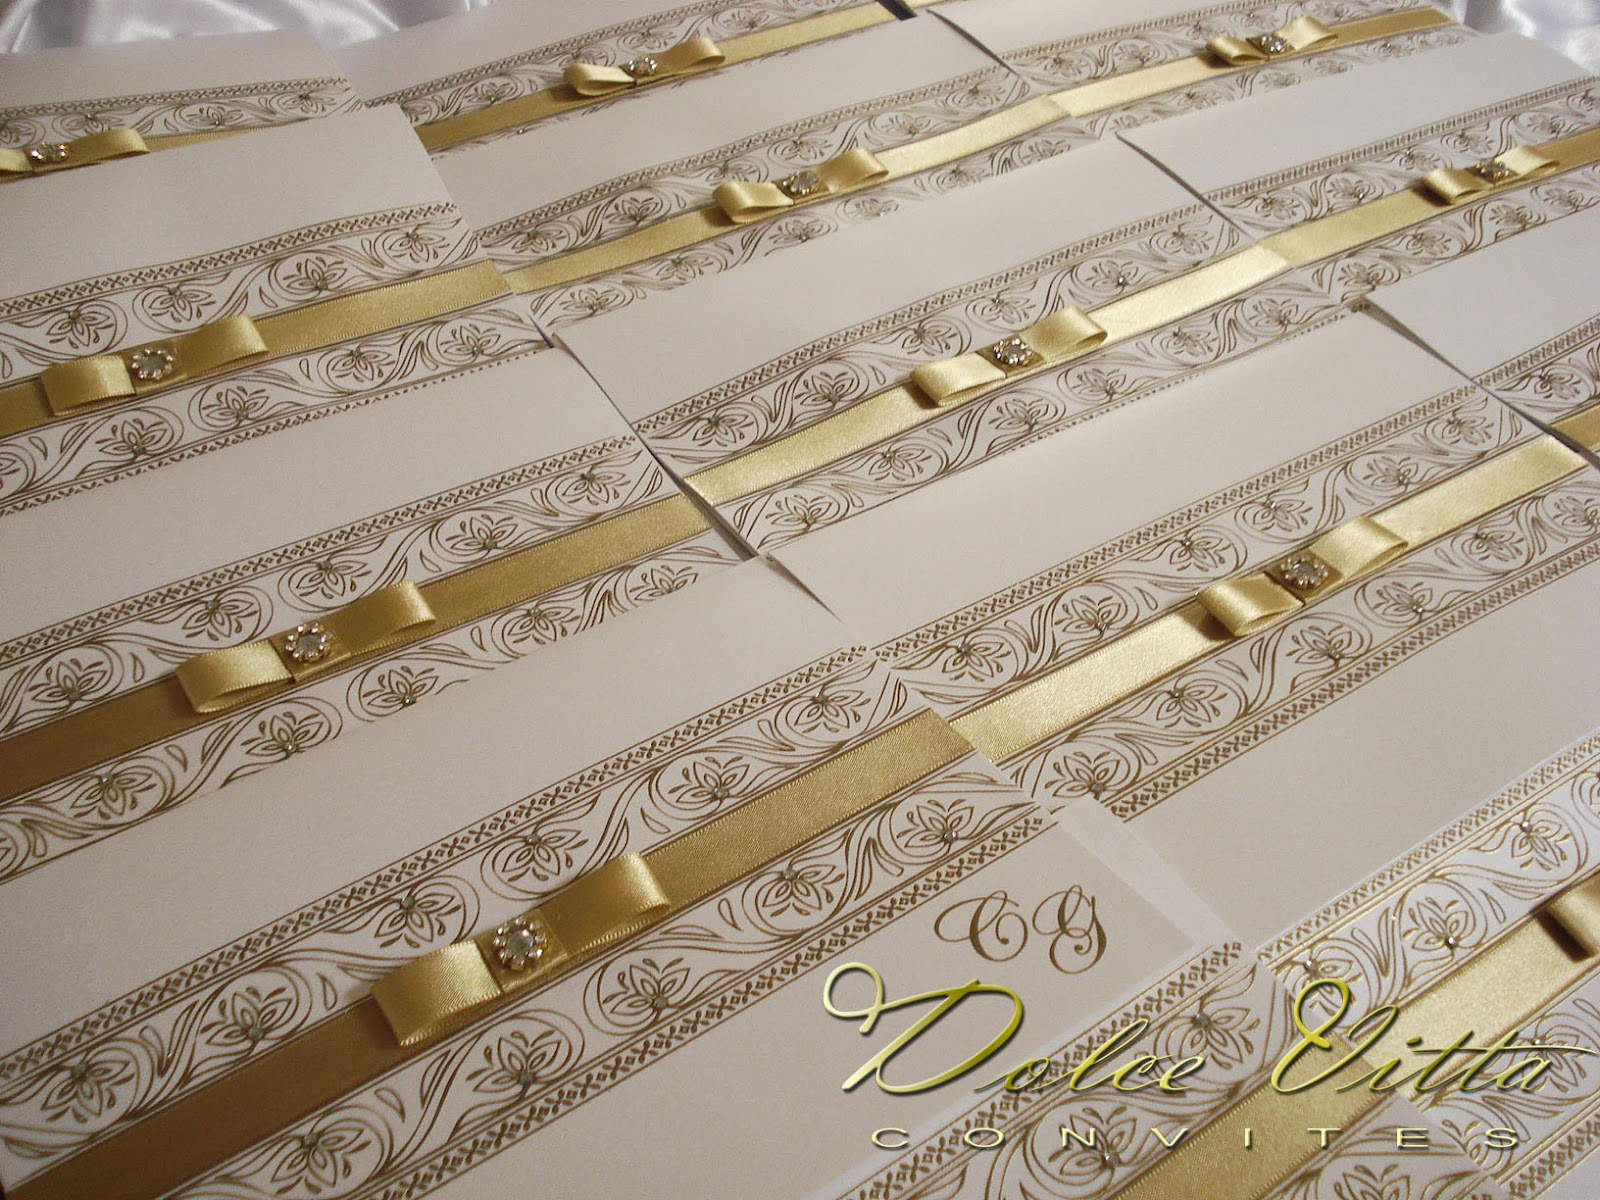 decorar ouro branco: Convite de Casamento Dourado e Branco em Papel Perolado !!! – cod:050